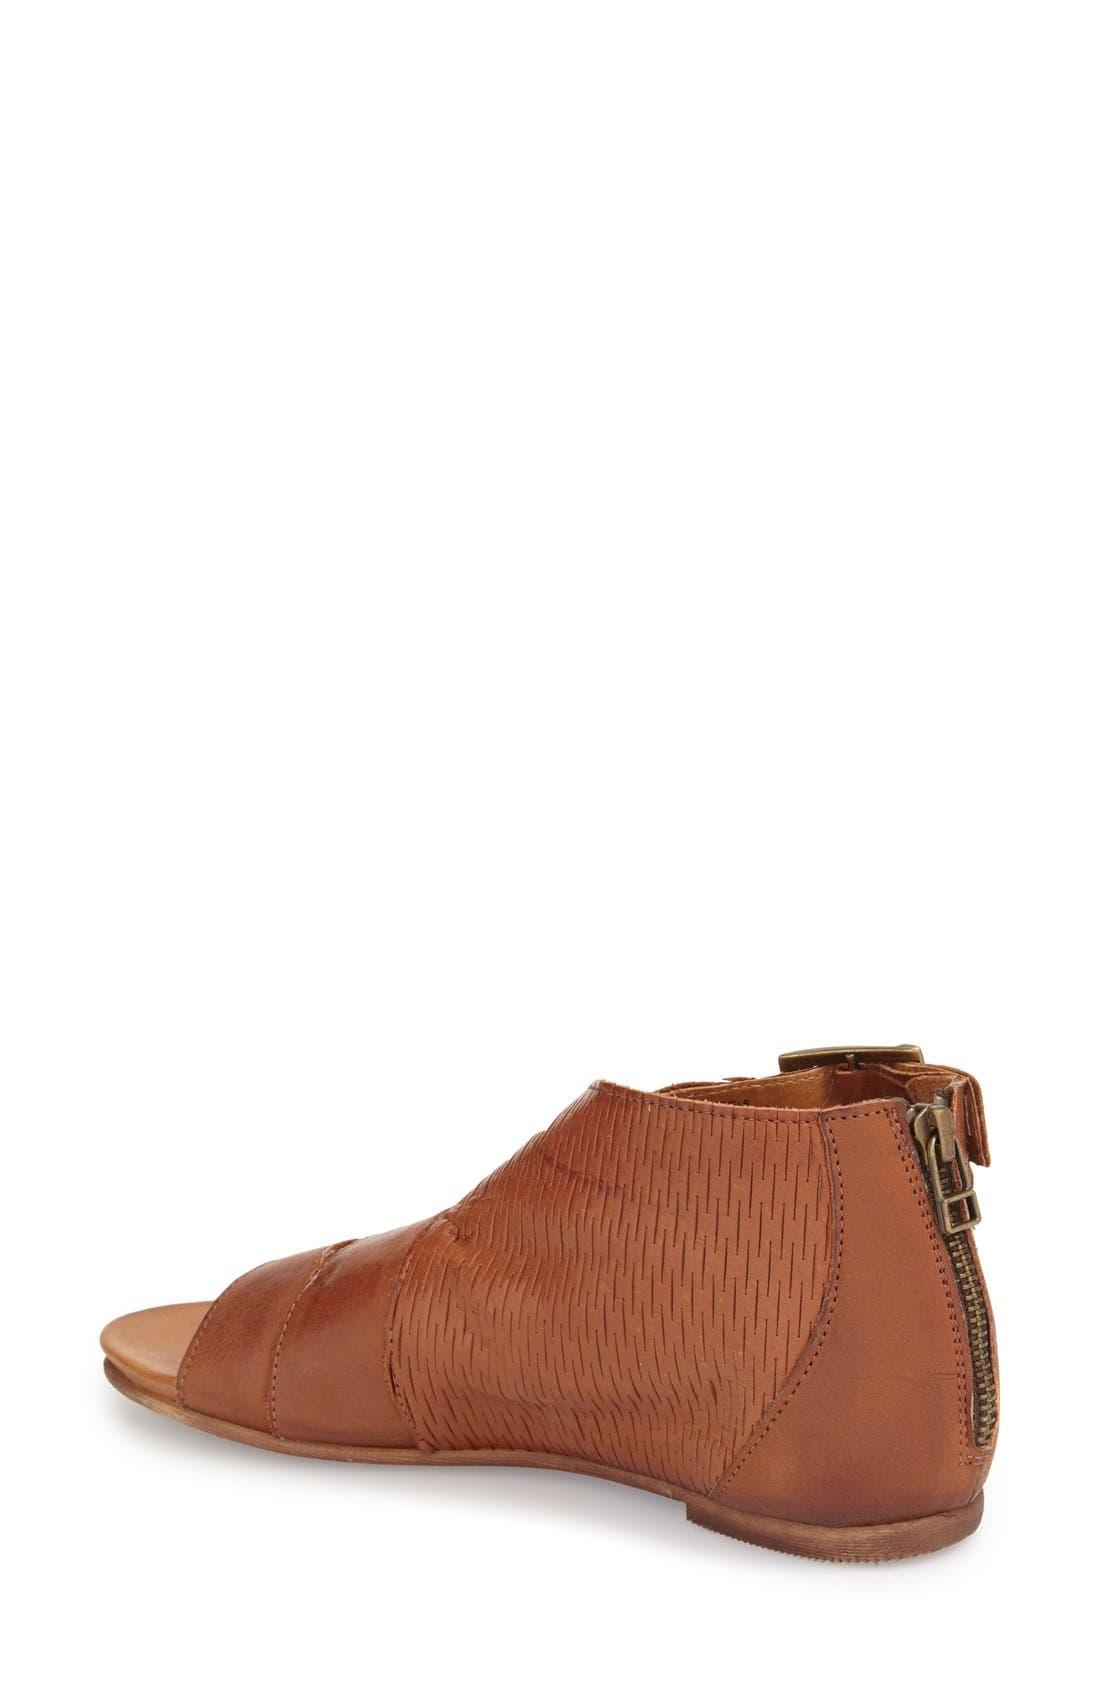 Alternate Image 2  - Miz Mooz 'Althea' Sandal (Women)